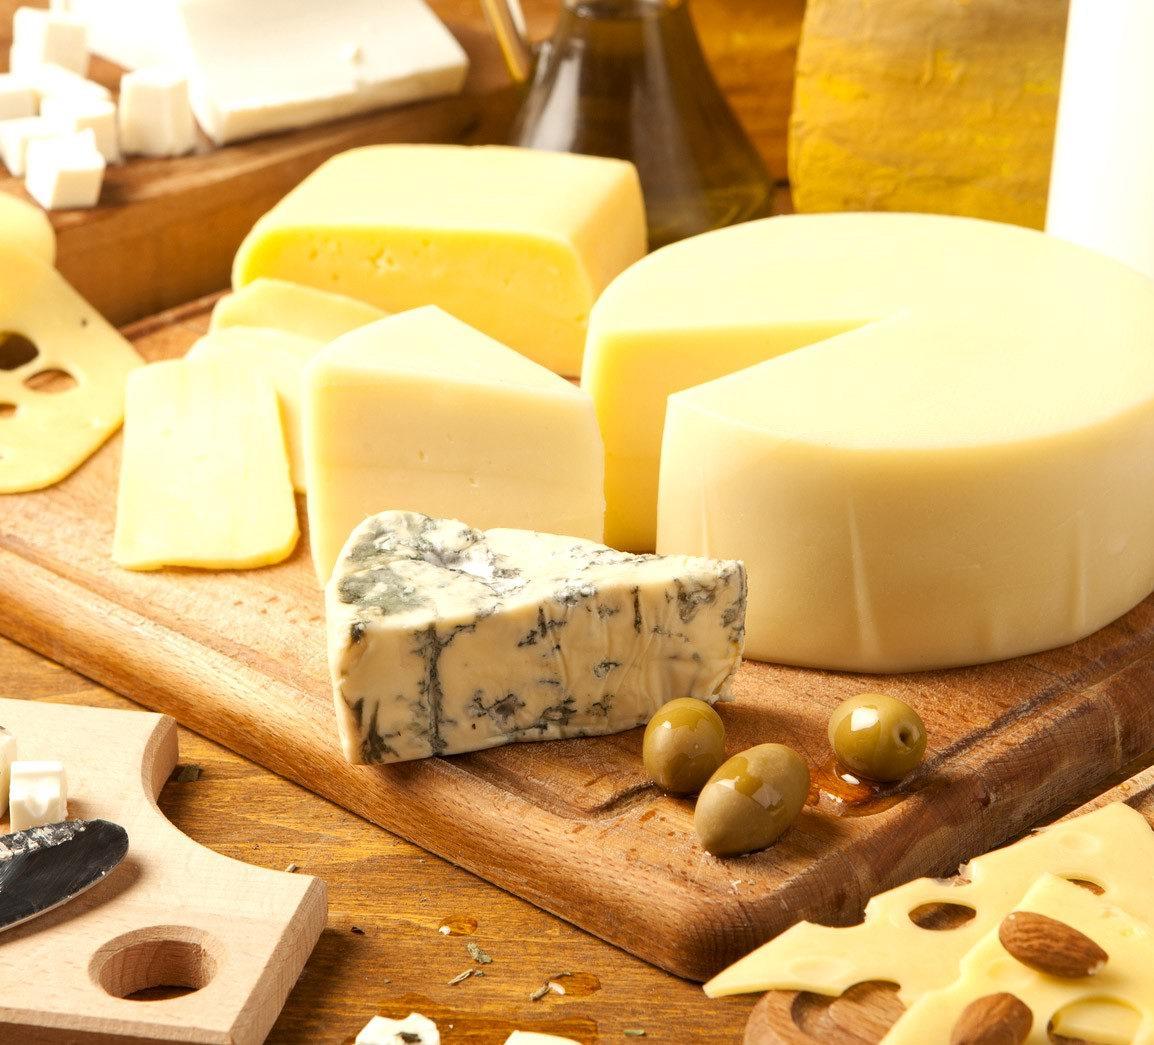 Мини цеха по производству сыра